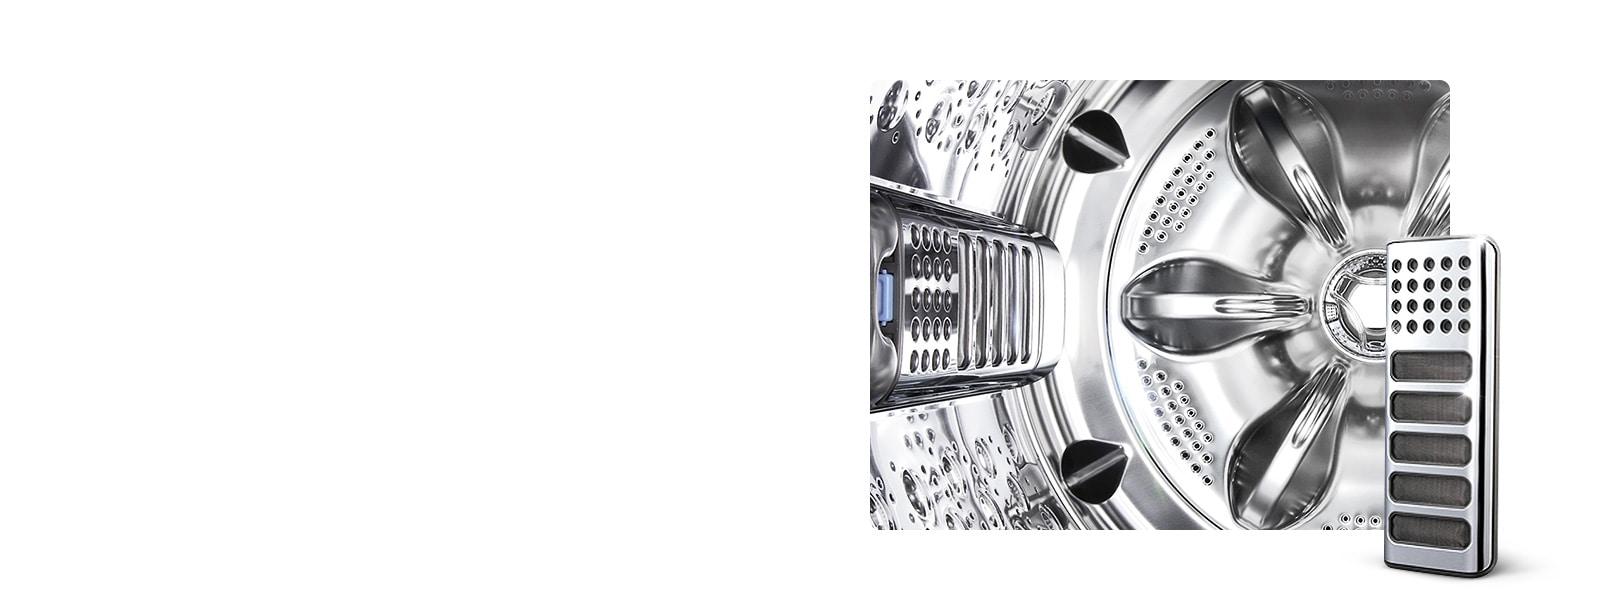 T2193EFHSKL_WM-SapienceHEDD-BlackSteel-09-Full-Stainless-Steel-tub-Desktop